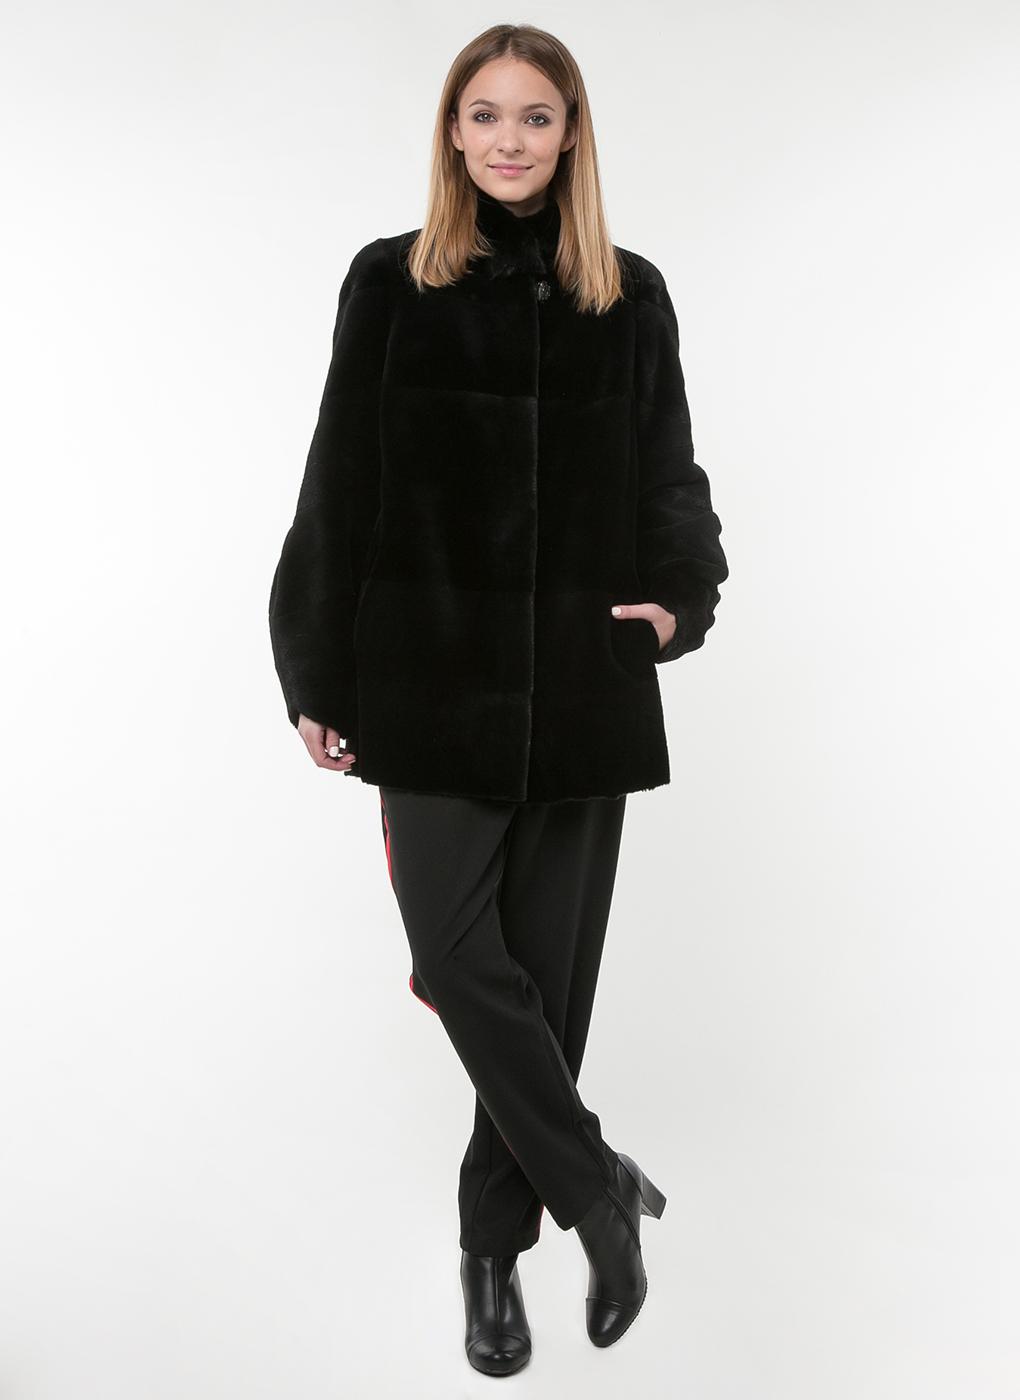 Куртка из нутрии Бернадет 01, Олимп фото